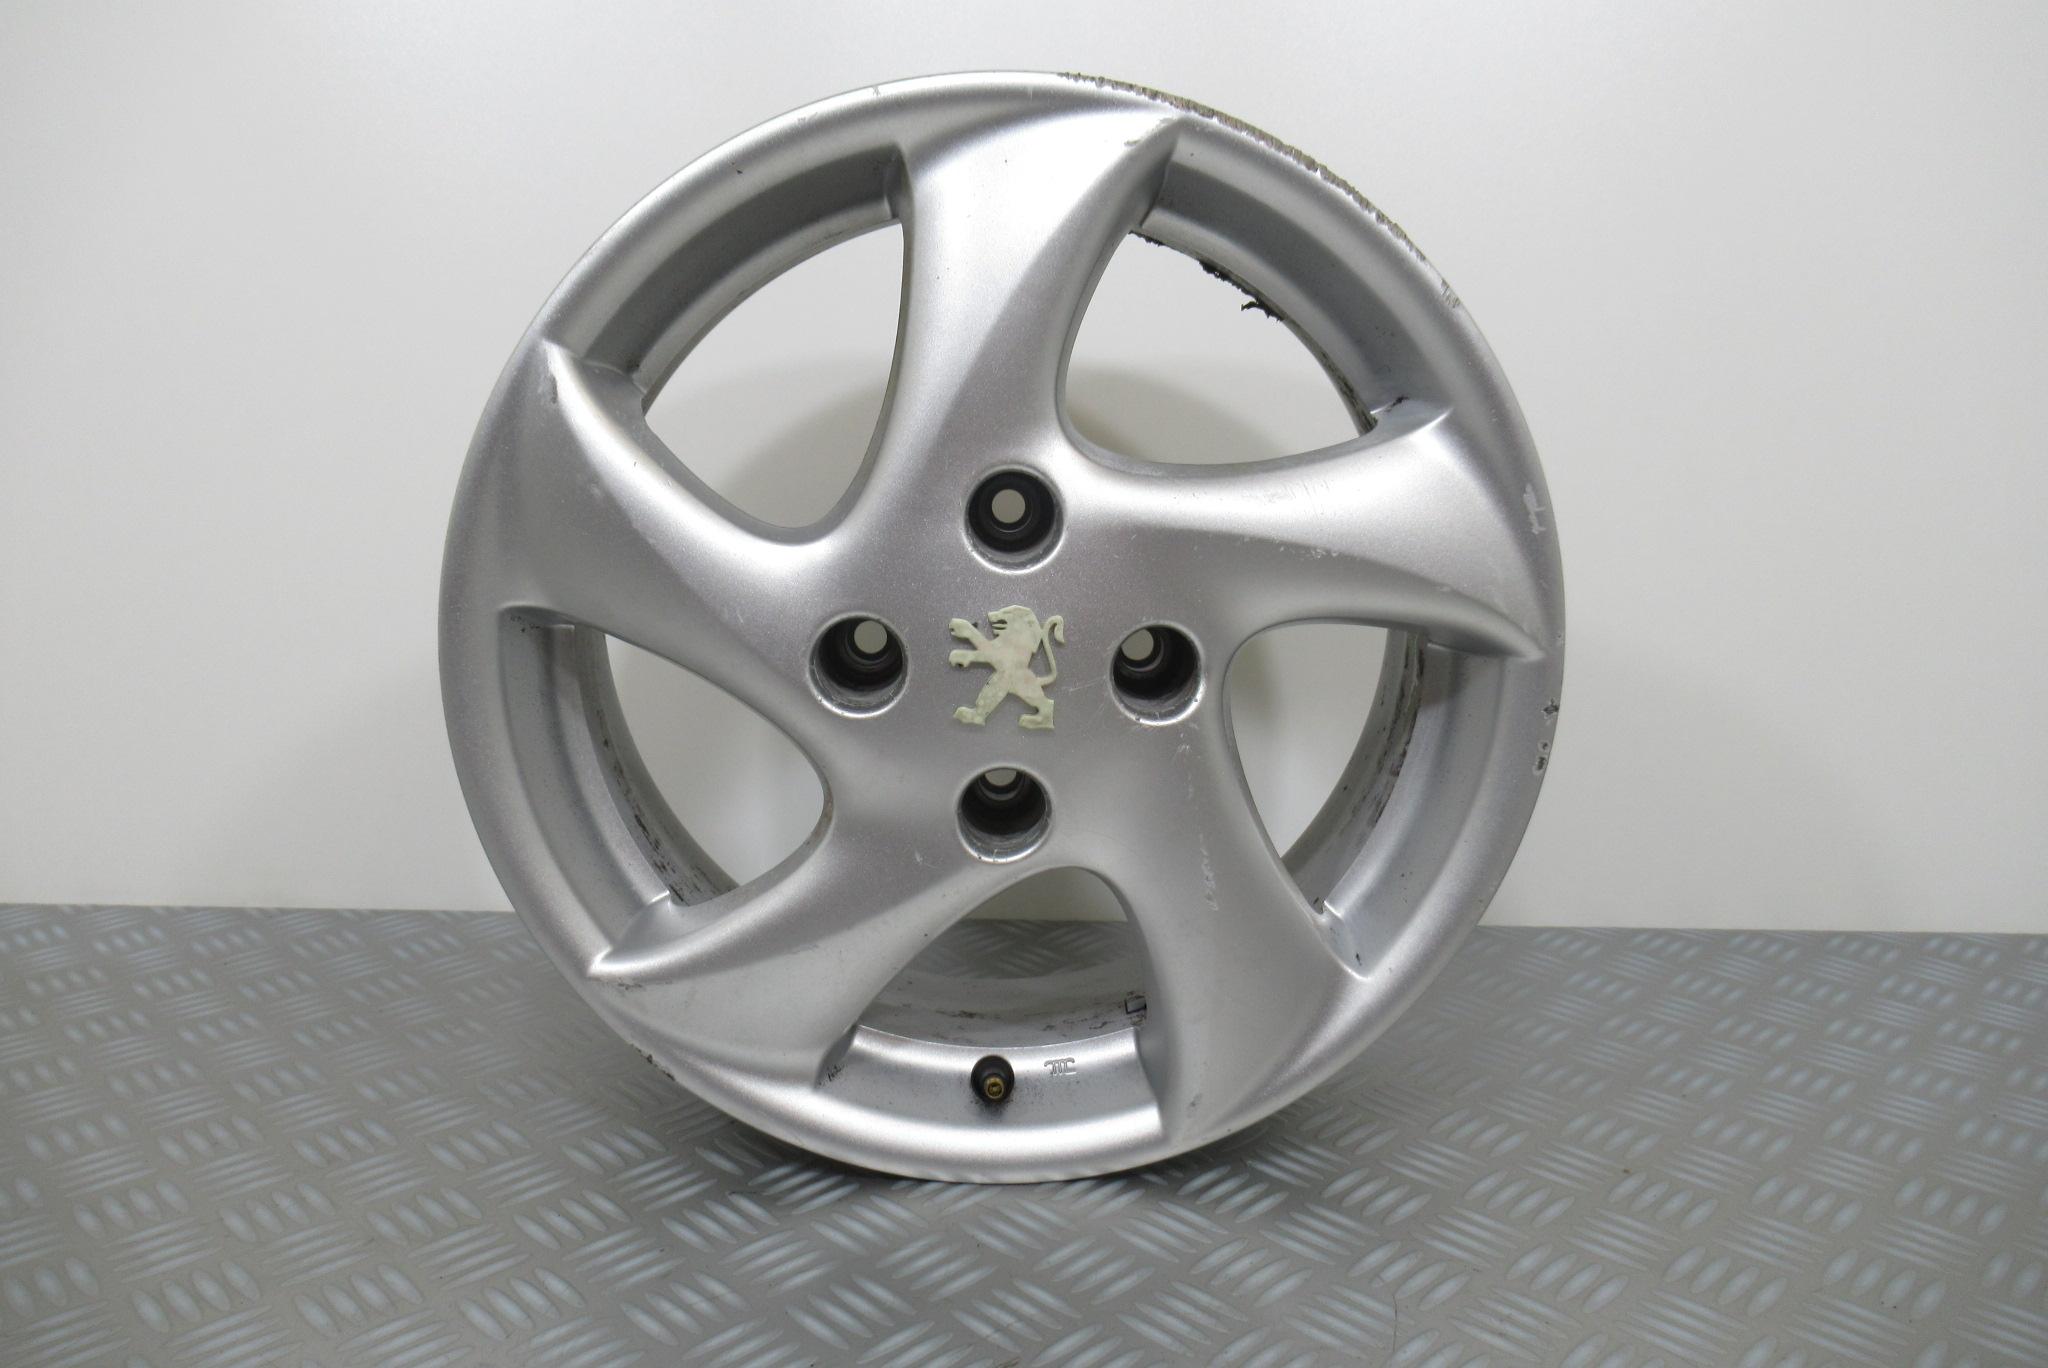 Cherche logo roue ?u=https%3A%2F%2Frecycl-auto-60.fr%2Fwp-content%2Fuploads%2FIMG_6408